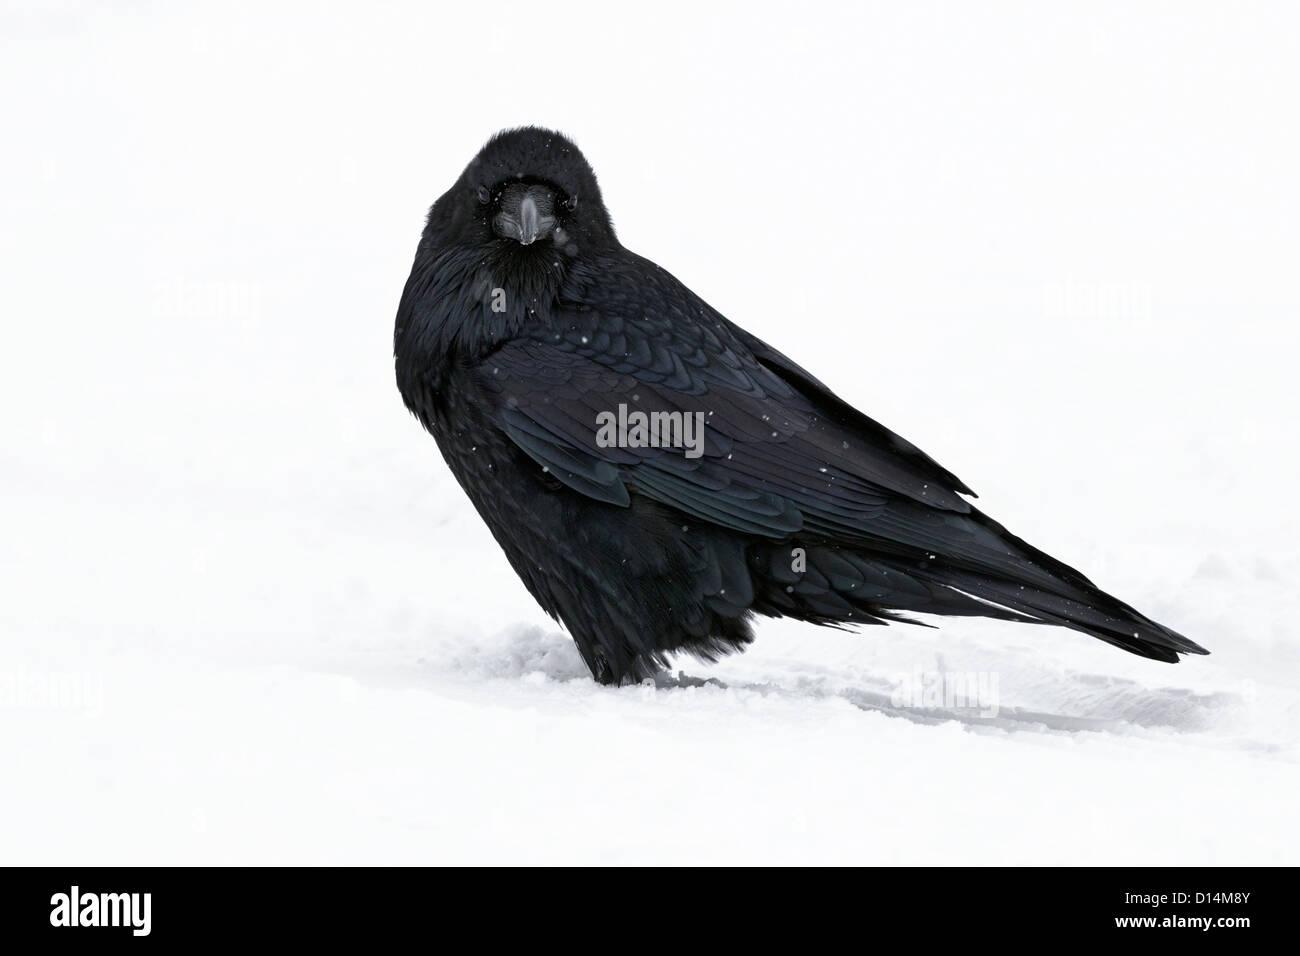 winter Raven in snow shower - Stock Image